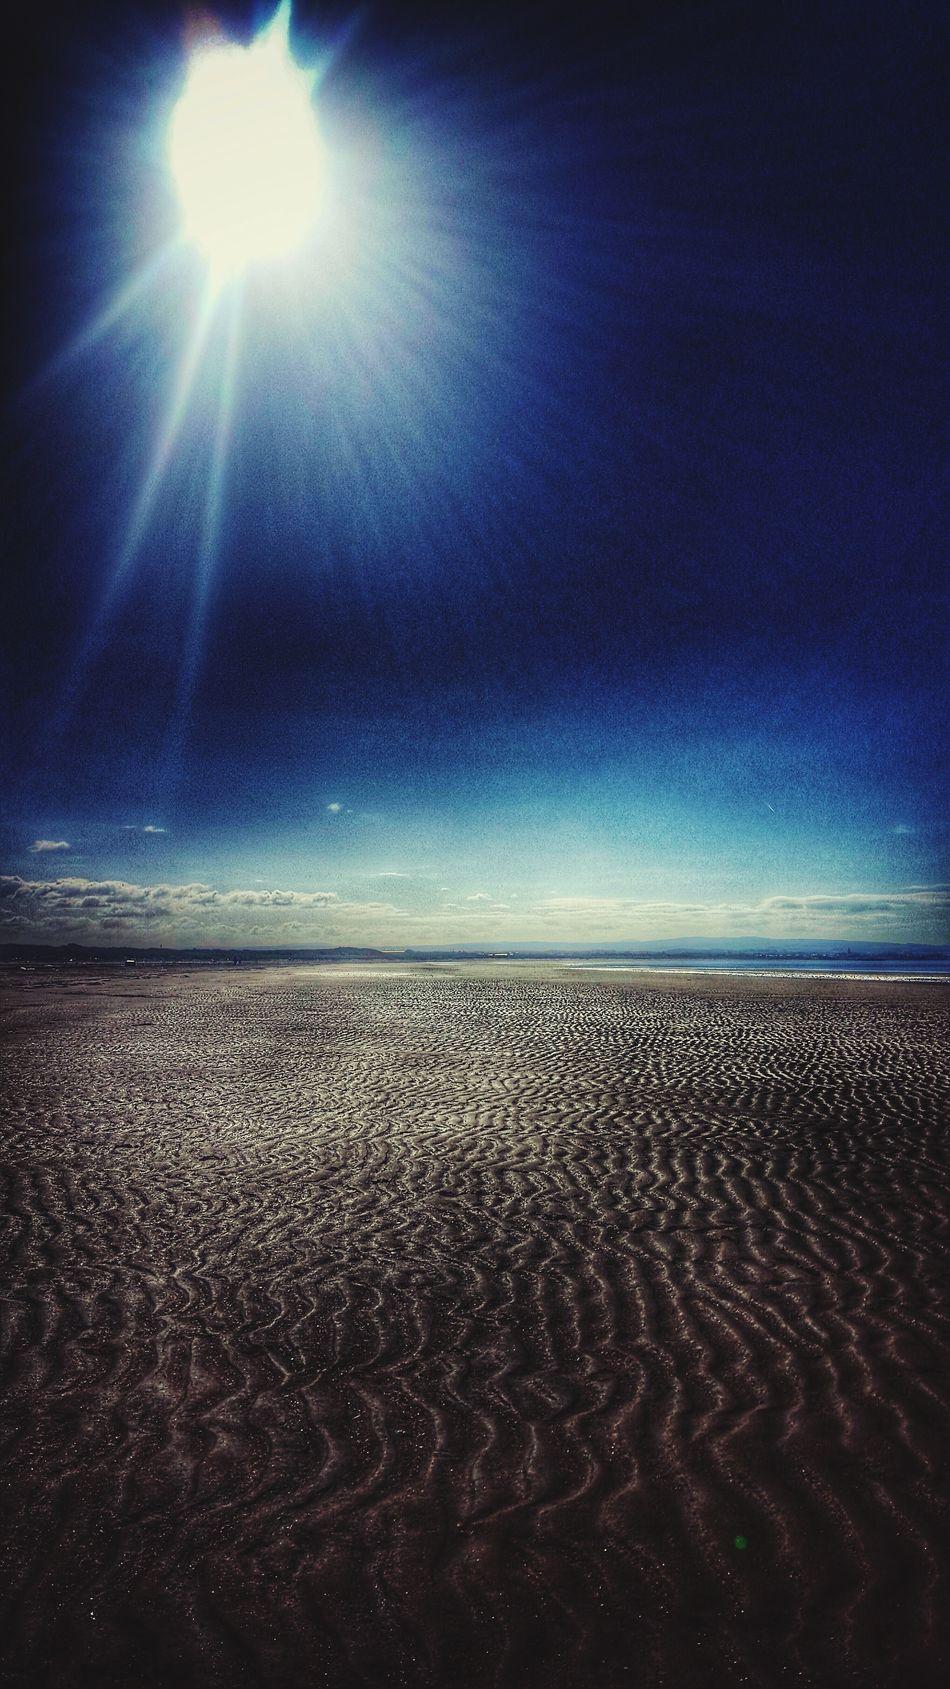 Sunlight Troonbeach Beachphotography Beach Walk Glorious Sunlight Troon Ayrshire, Scotland Sandripples Tides Peace NatureAtItsBest